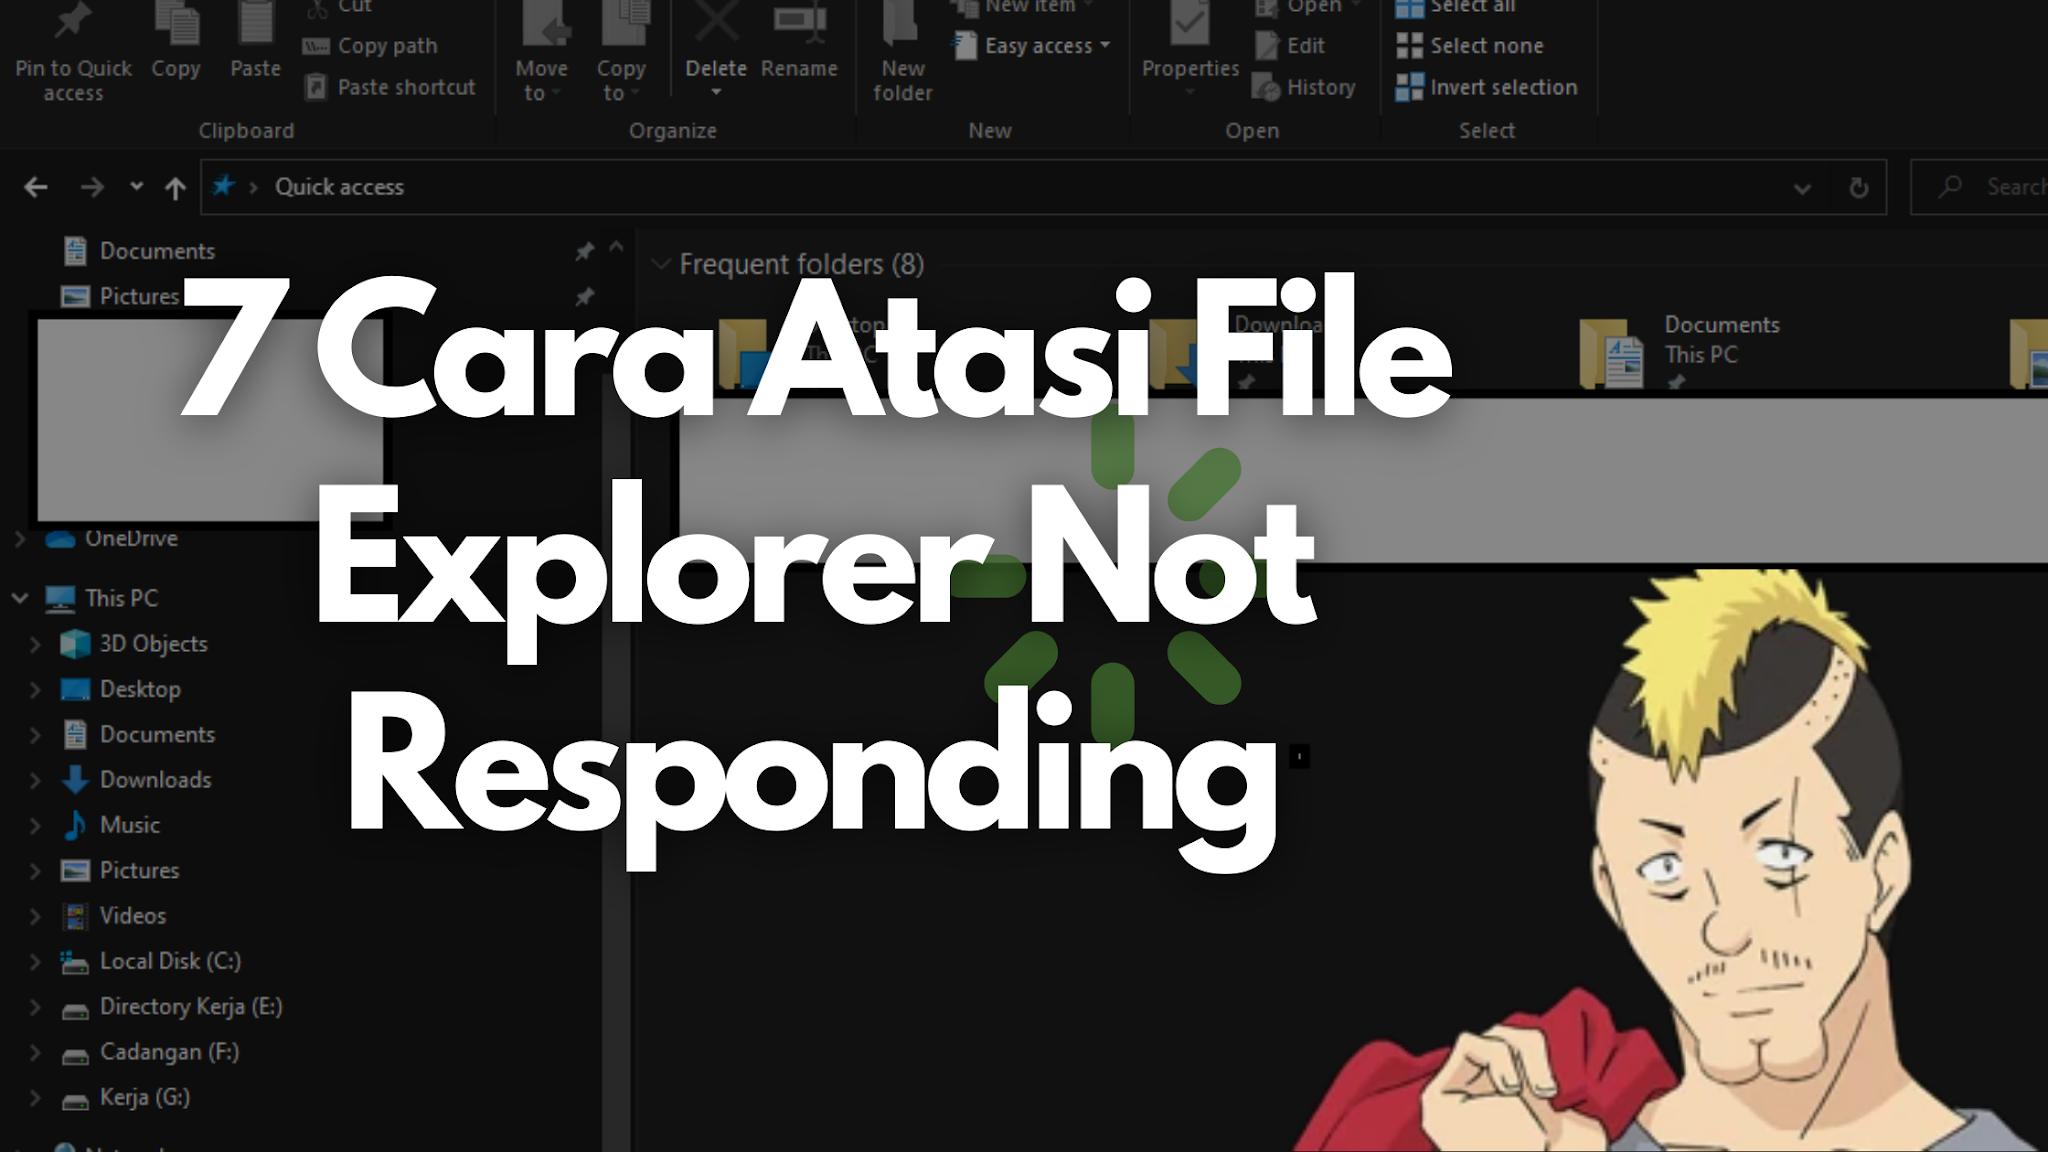 7 Cara Atasi File Explorer Not Responding